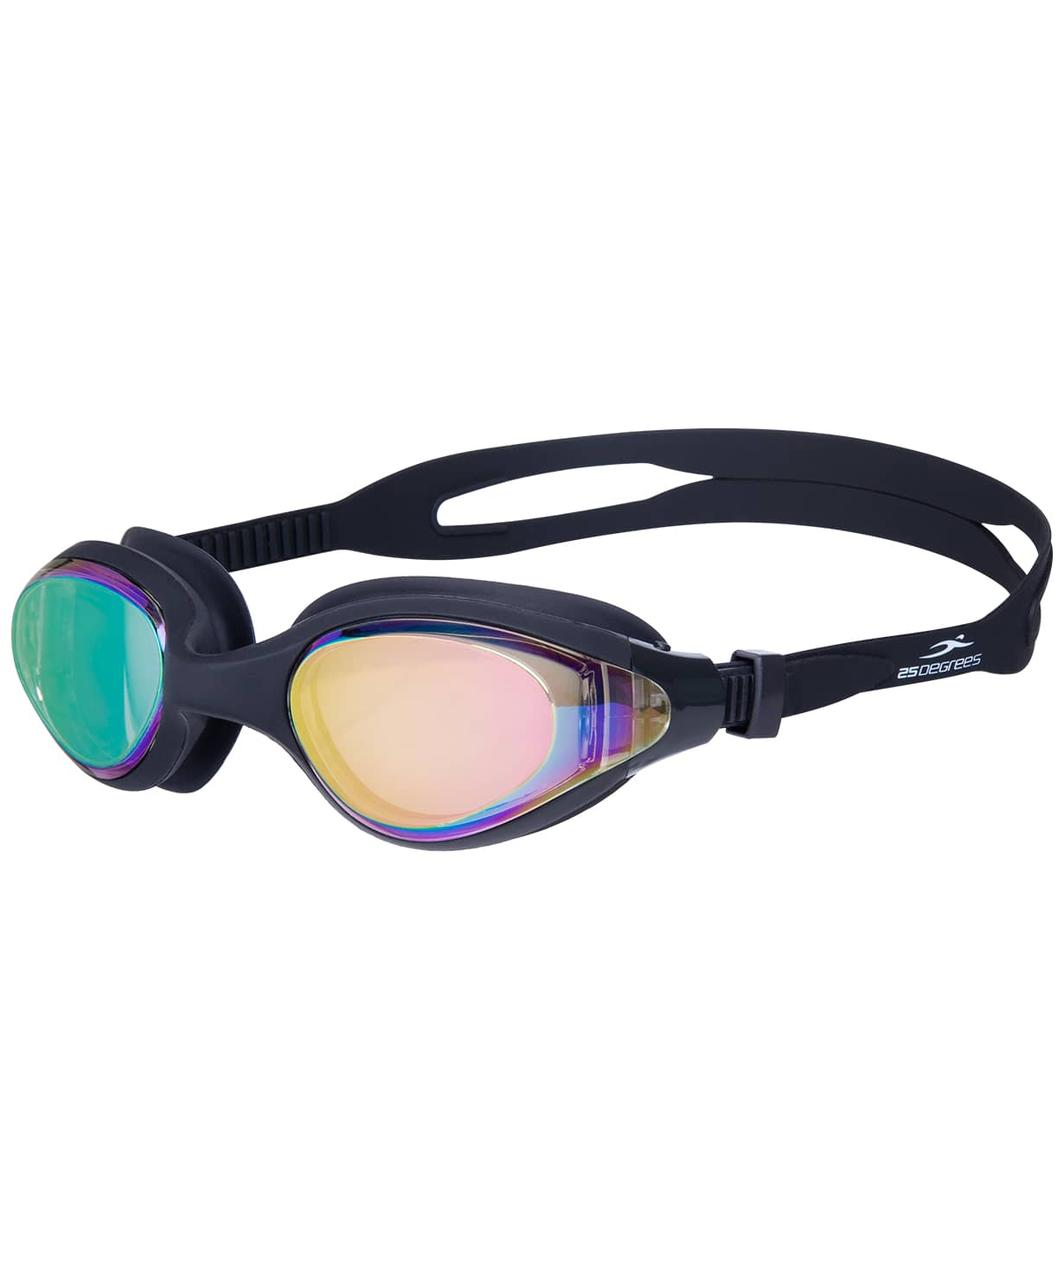 Очки для плавания Prive Mirrored Black 25Degrees